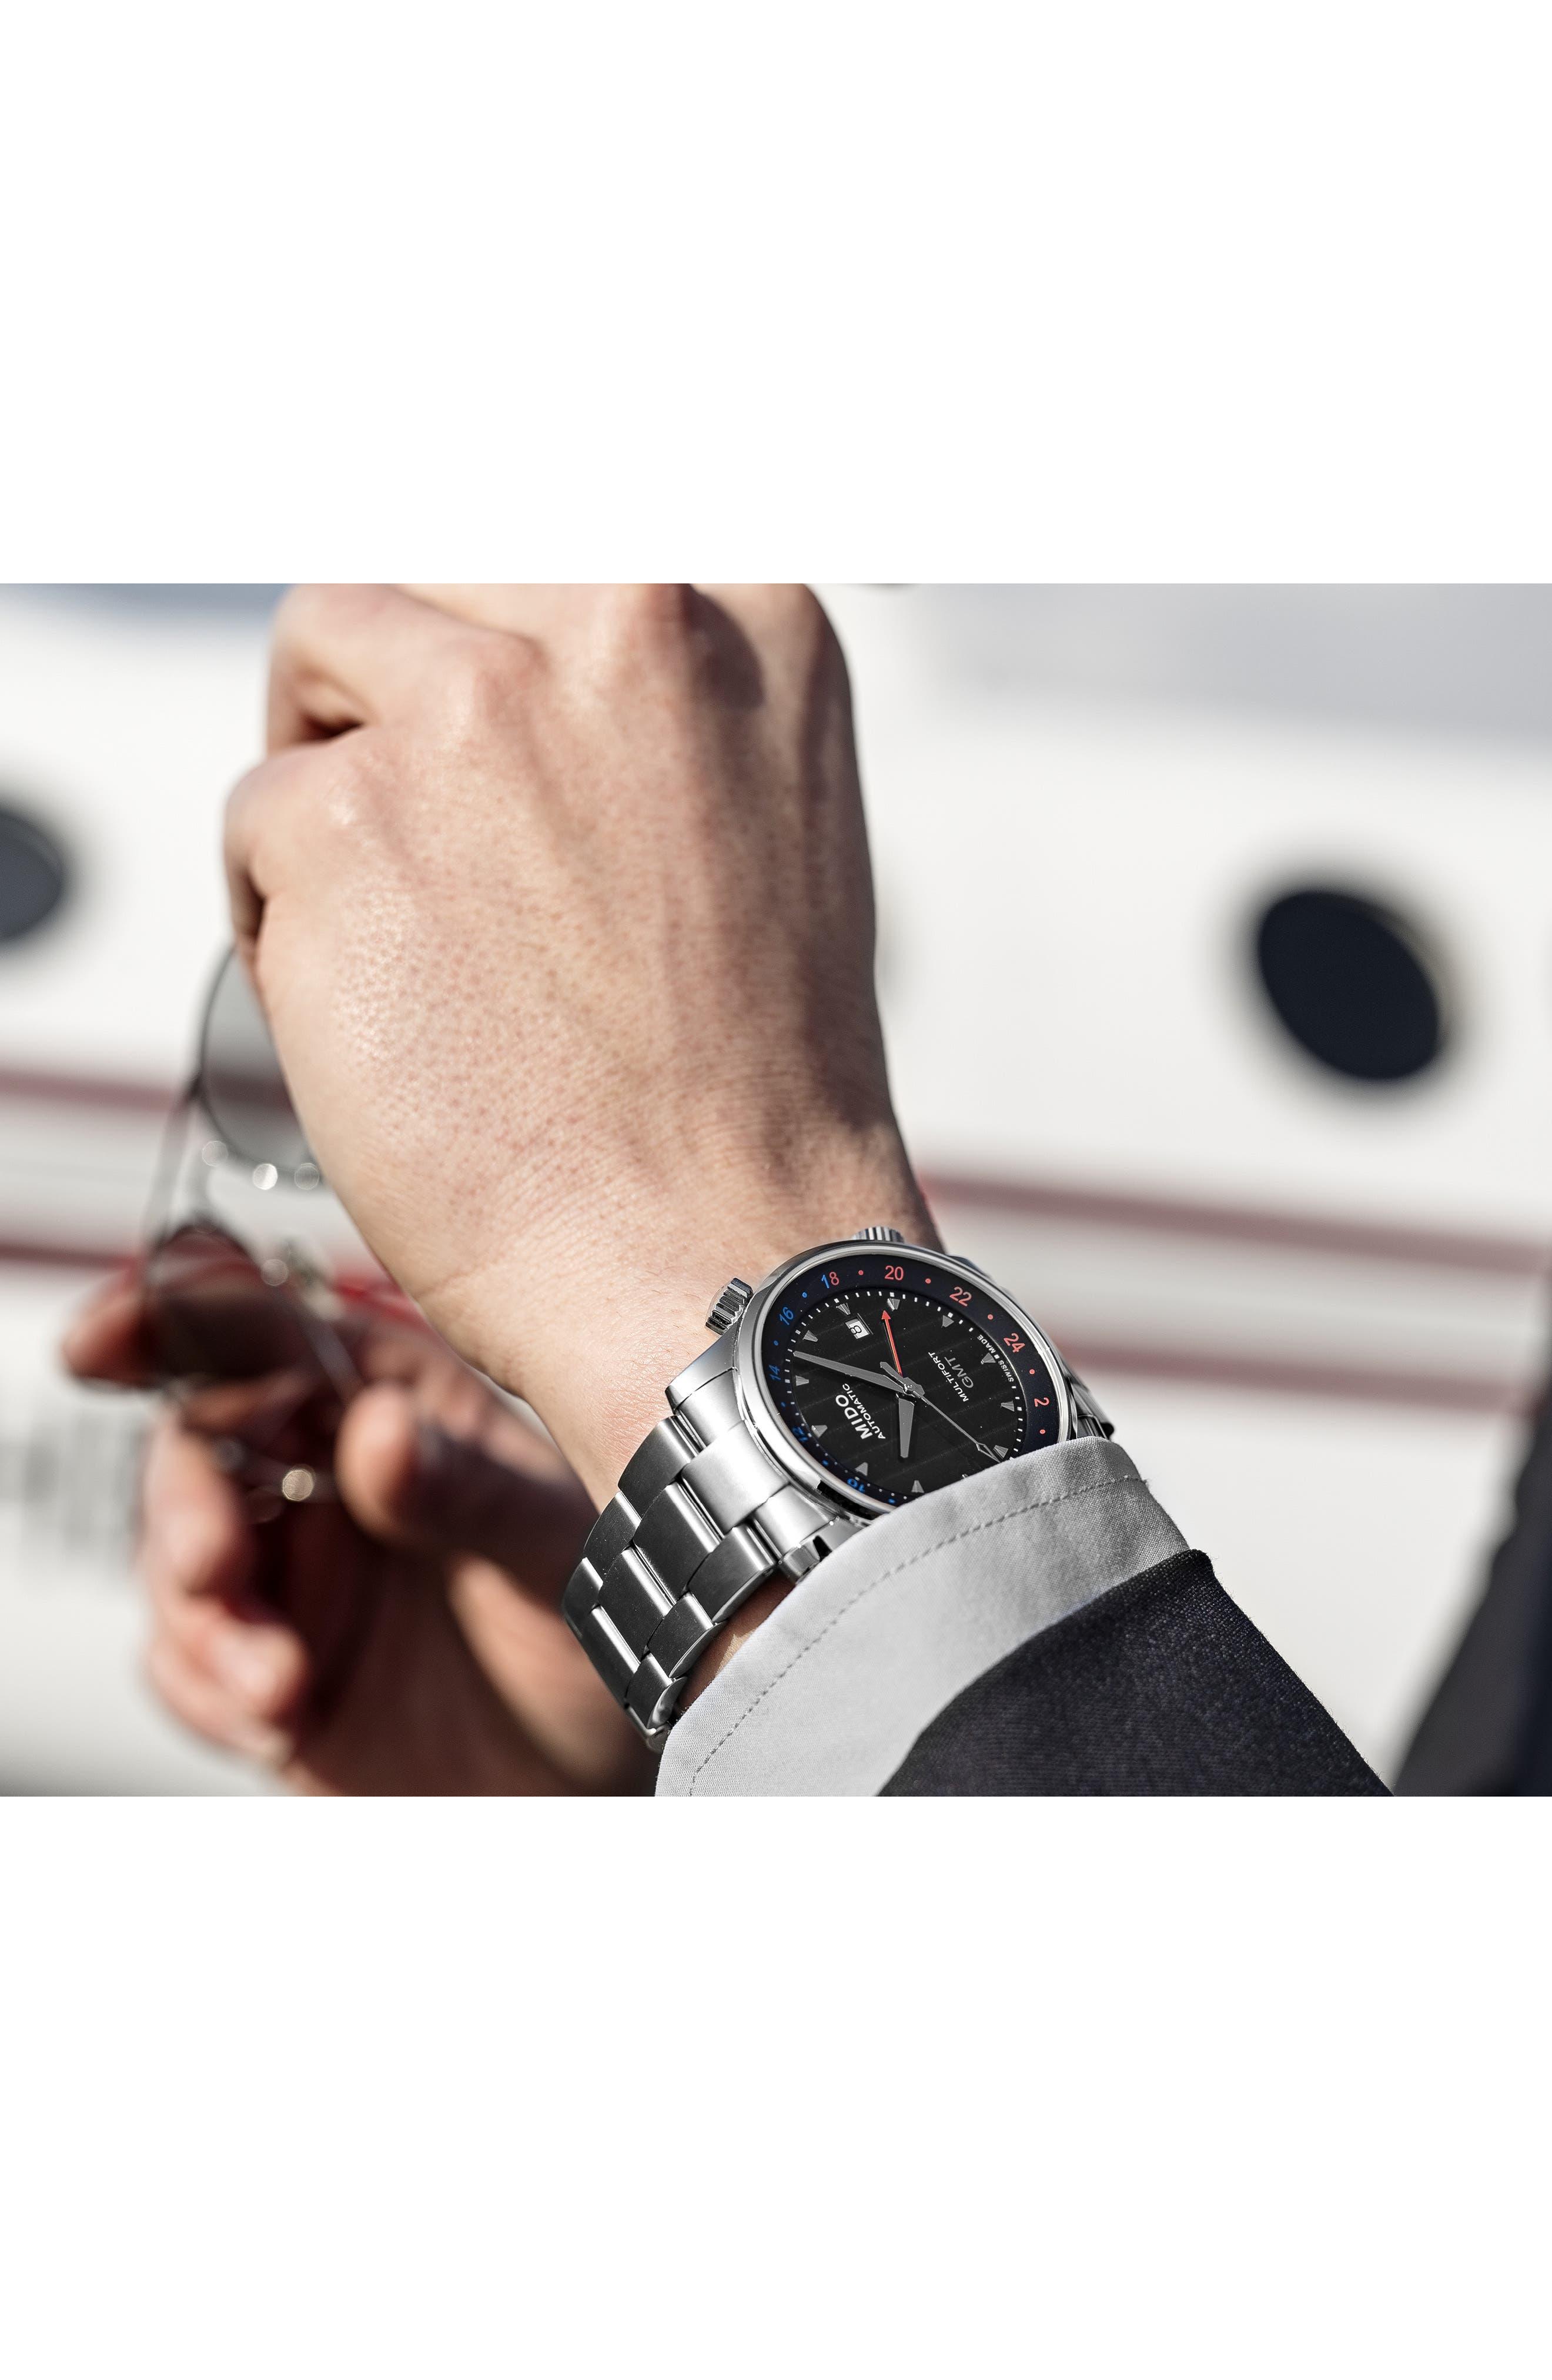 Multifort Automatic Bracelet Watch,                             Alternate thumbnail 4, color,                             SILVER/ BLACK/ SILVER